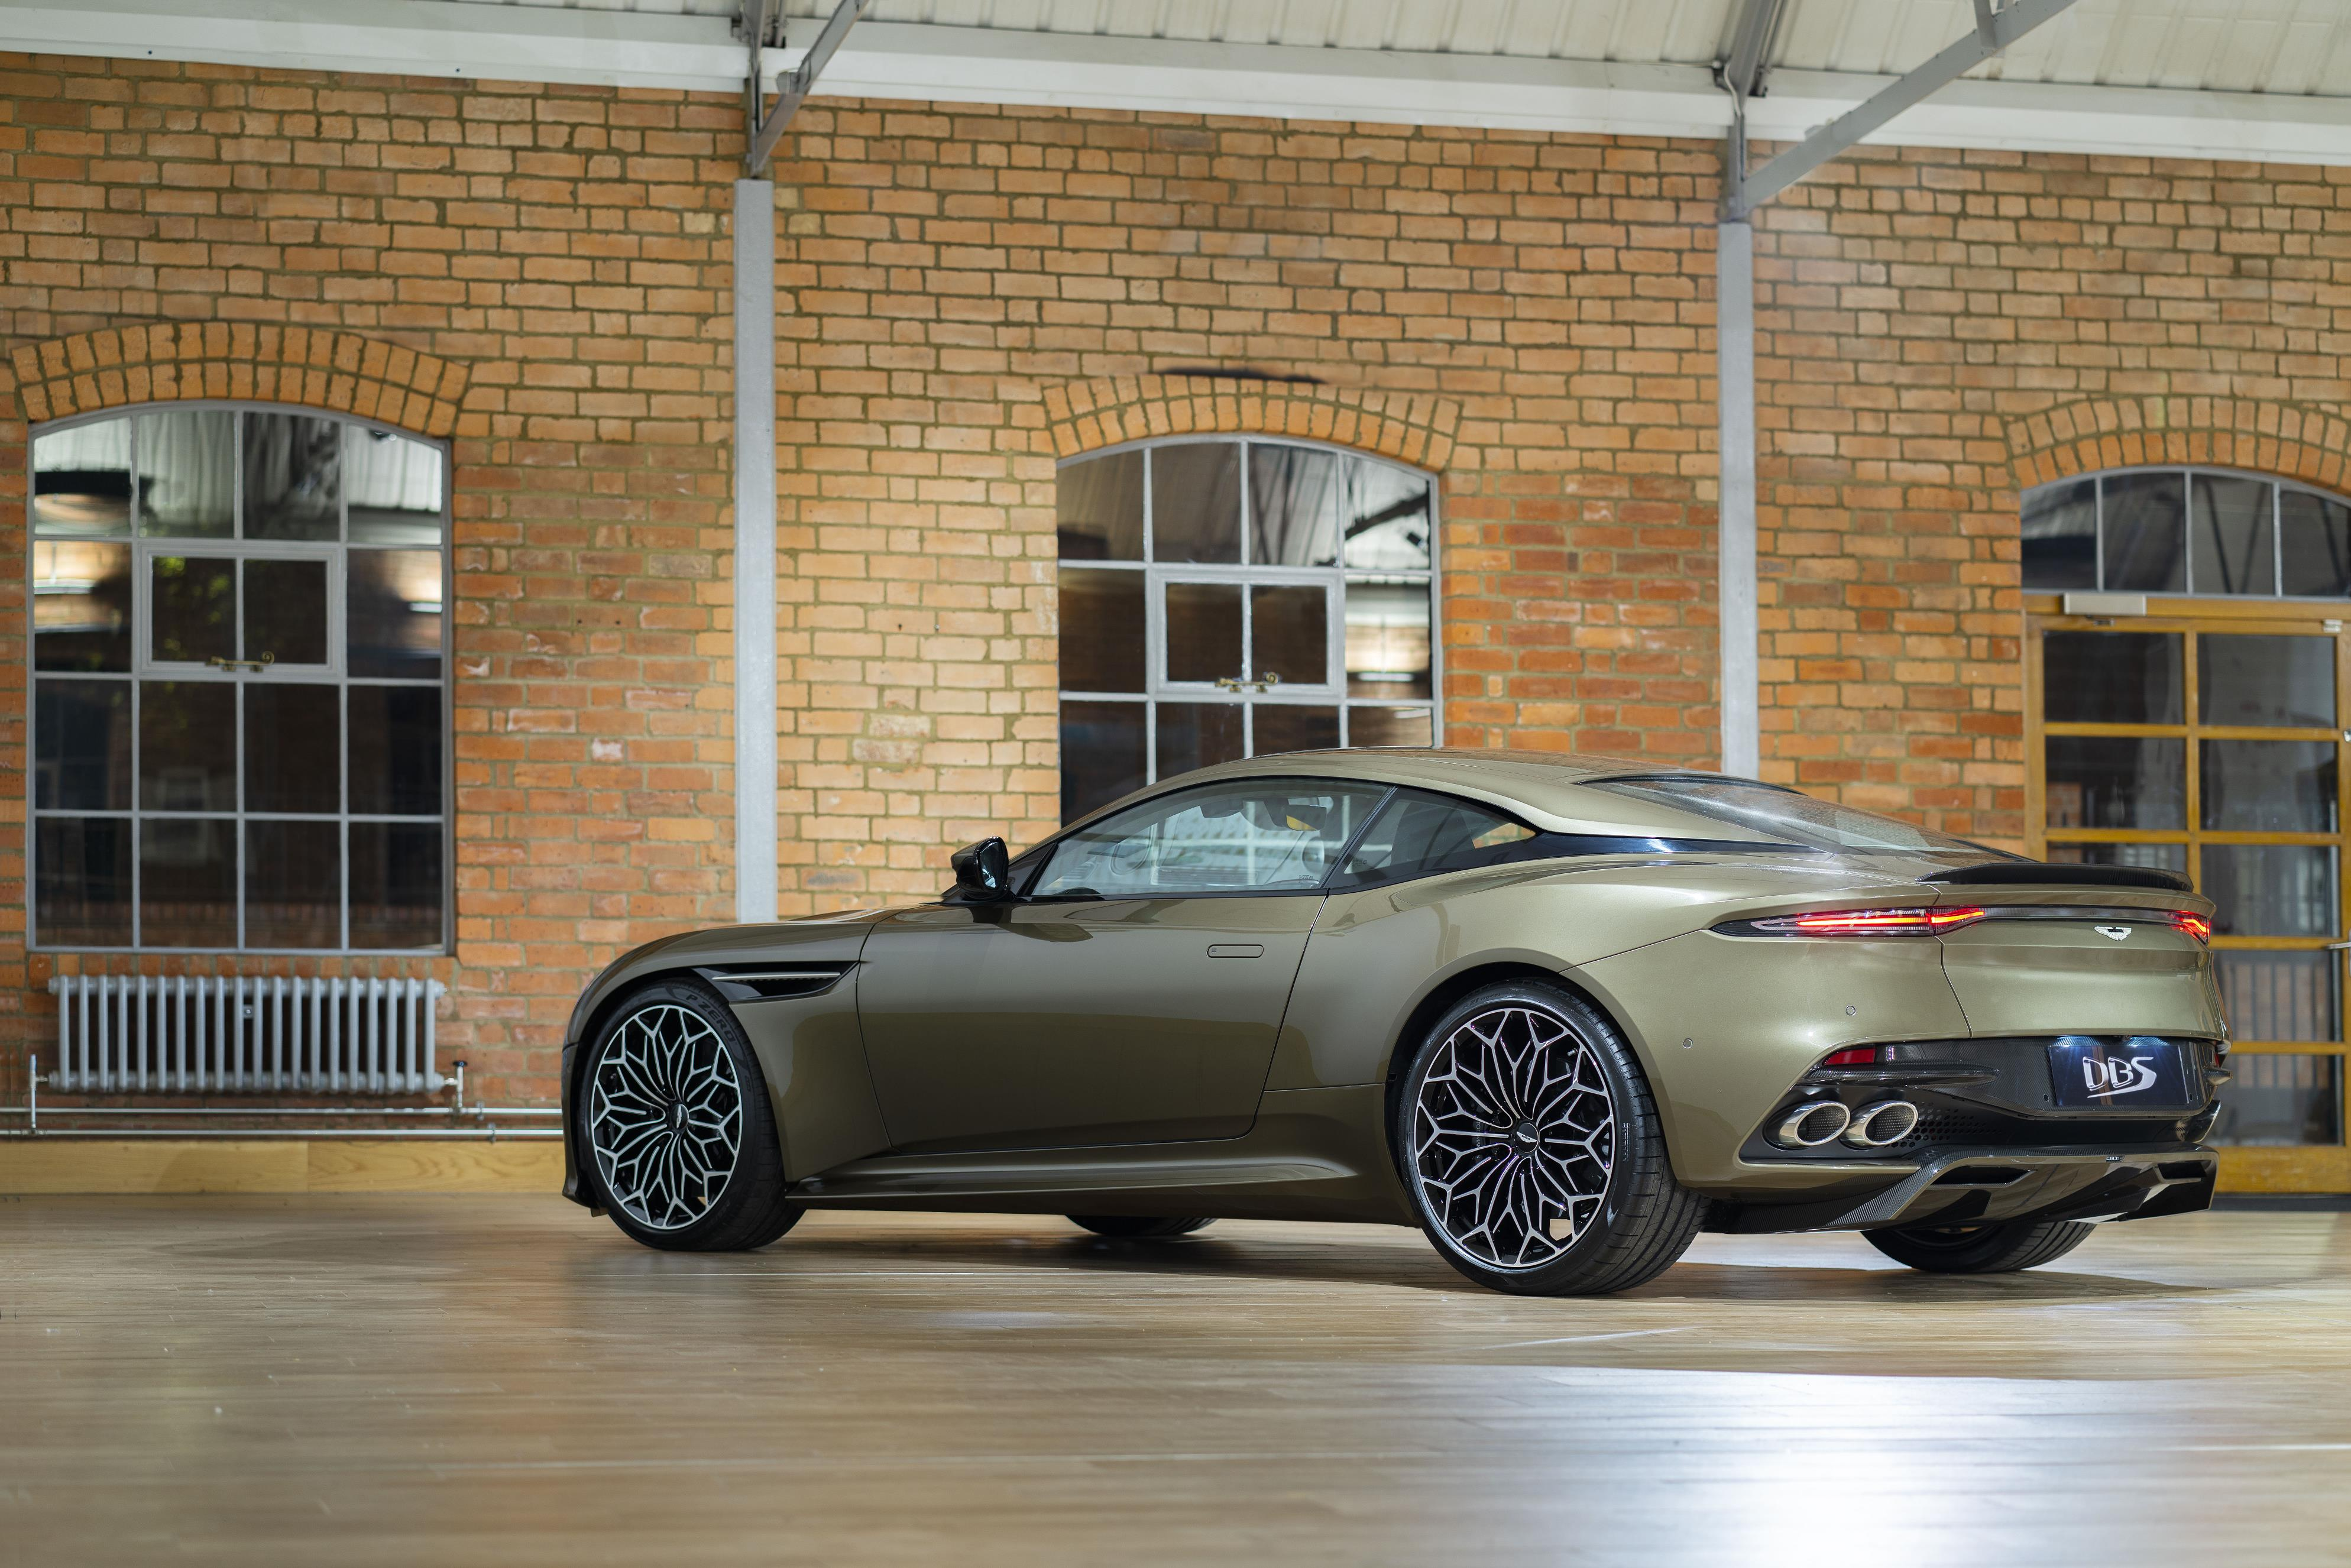 Aston Martin DBS Superleggera Rear Side